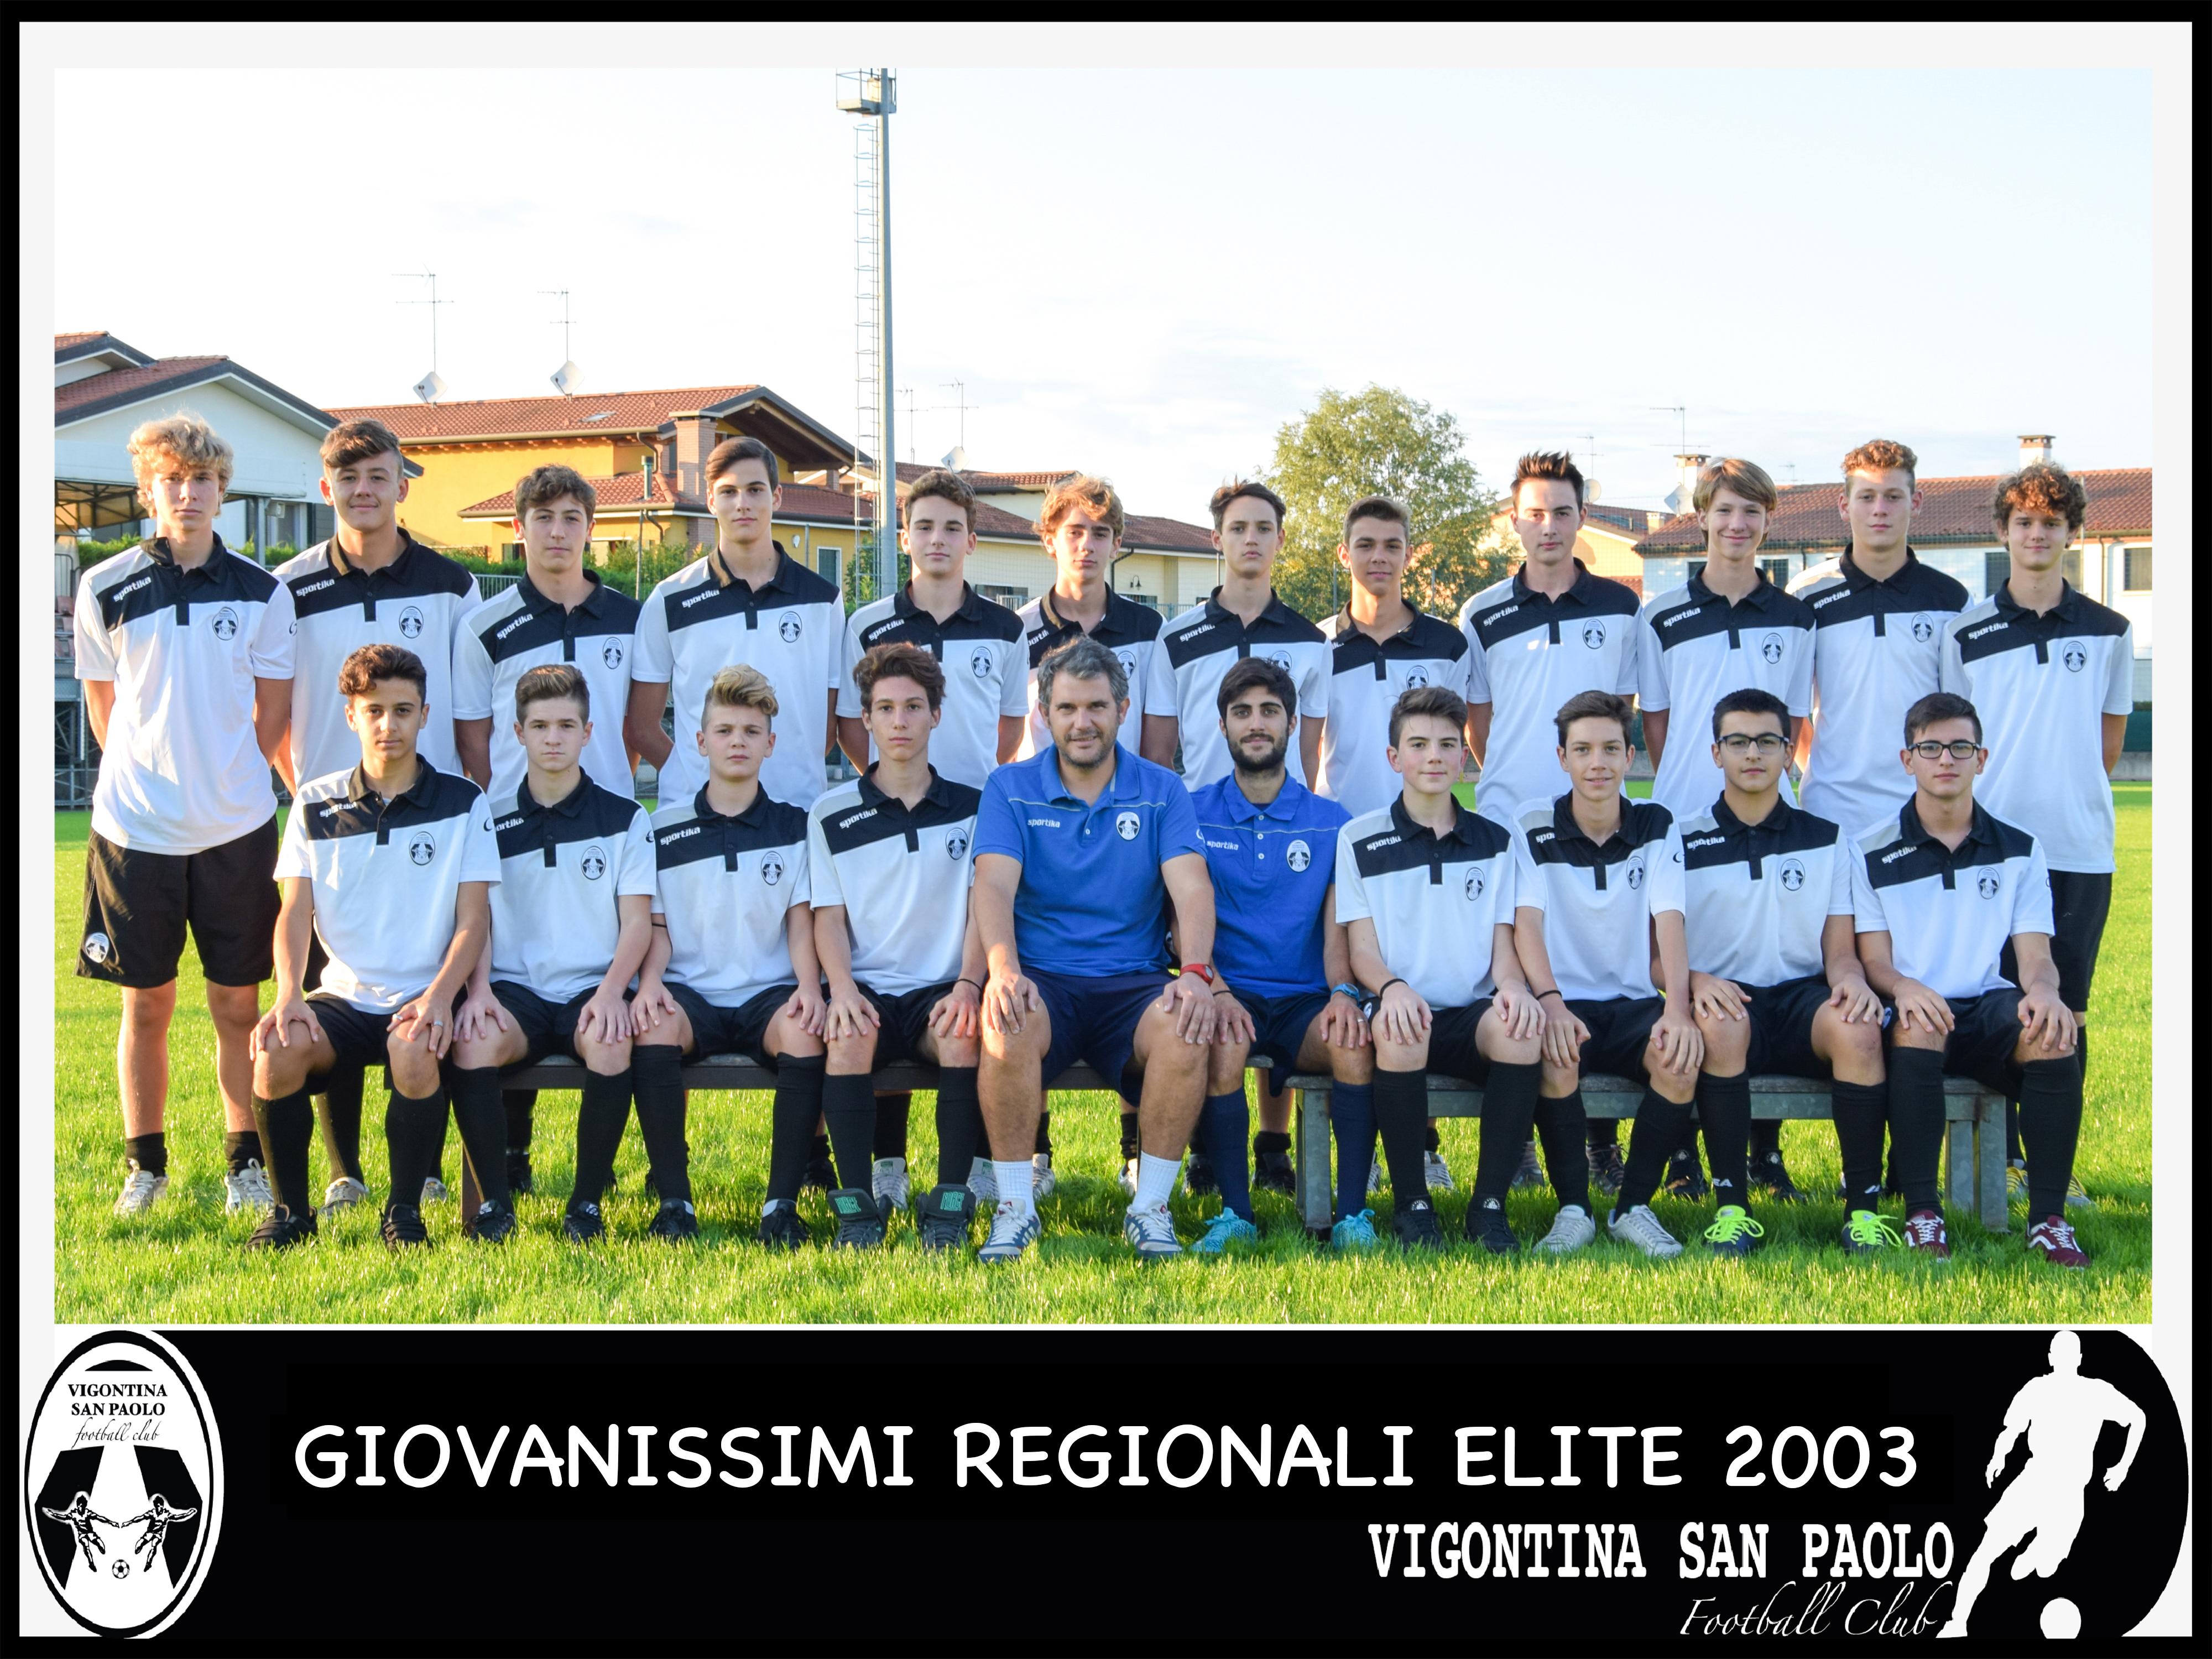 Calendario Giovanissimi Regionali.Giovanissimi Regionali Elite 2003 Tombolo Vigontina San